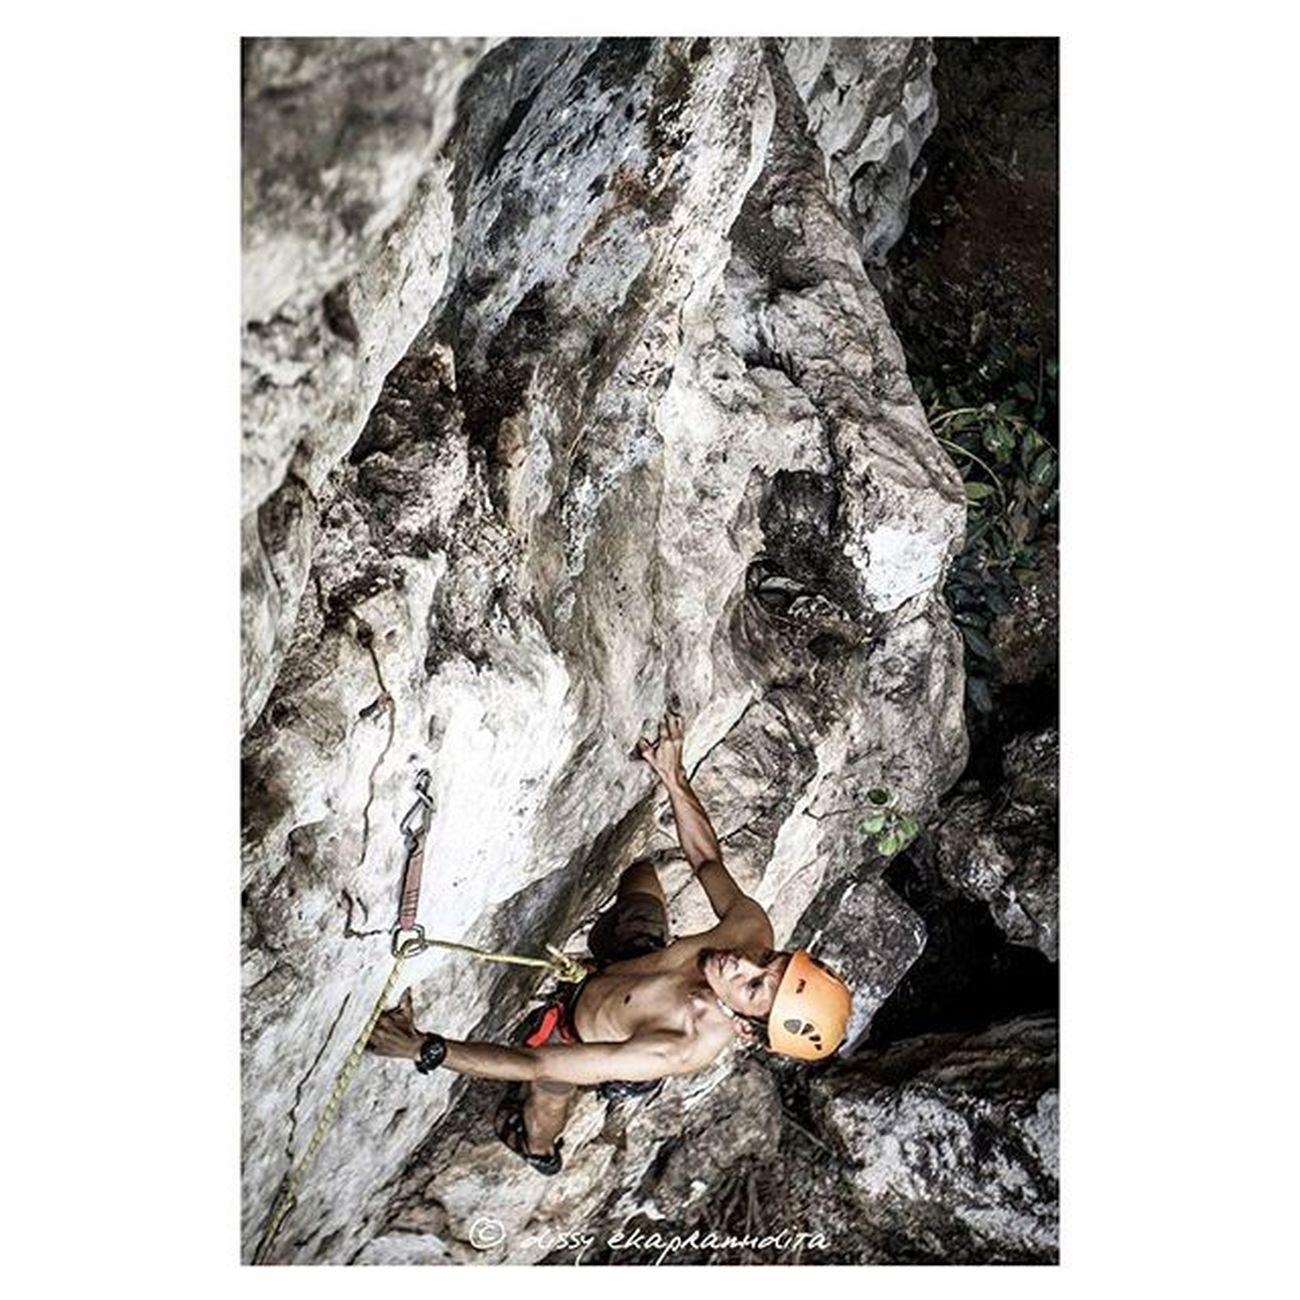 in action Climber RockClimbing Petmet Petzlgram Petzl 1000kata INDONESIA Natgeoadventure Nationalgeographic Asiangeographic Instalike Instagram Instagood Instadaily Instamood Photooftheday